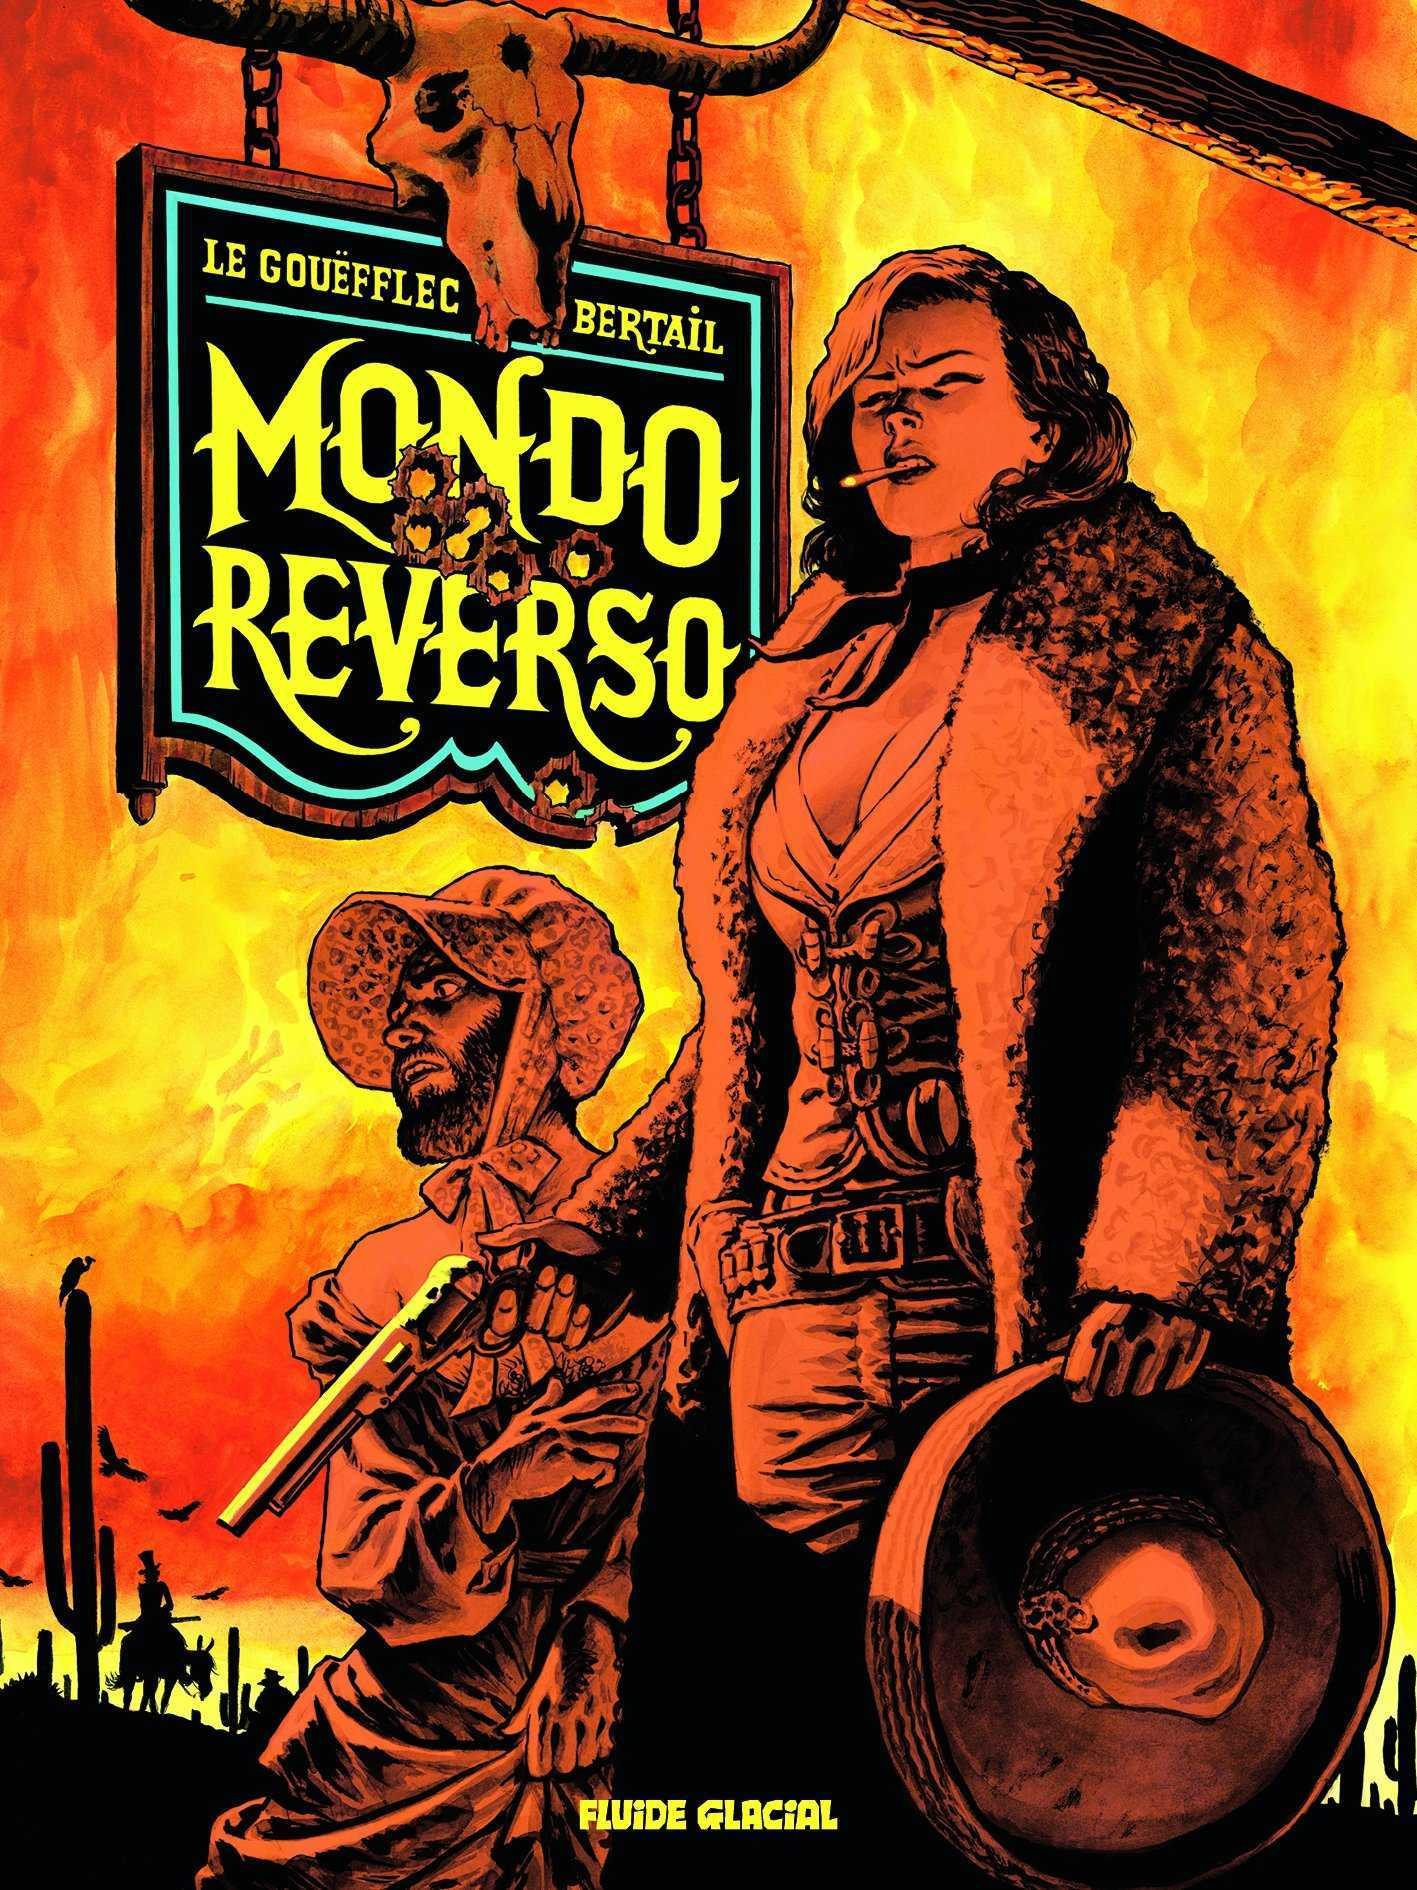 Mondo Reverso, western transgenre et subtil qui aura une suite